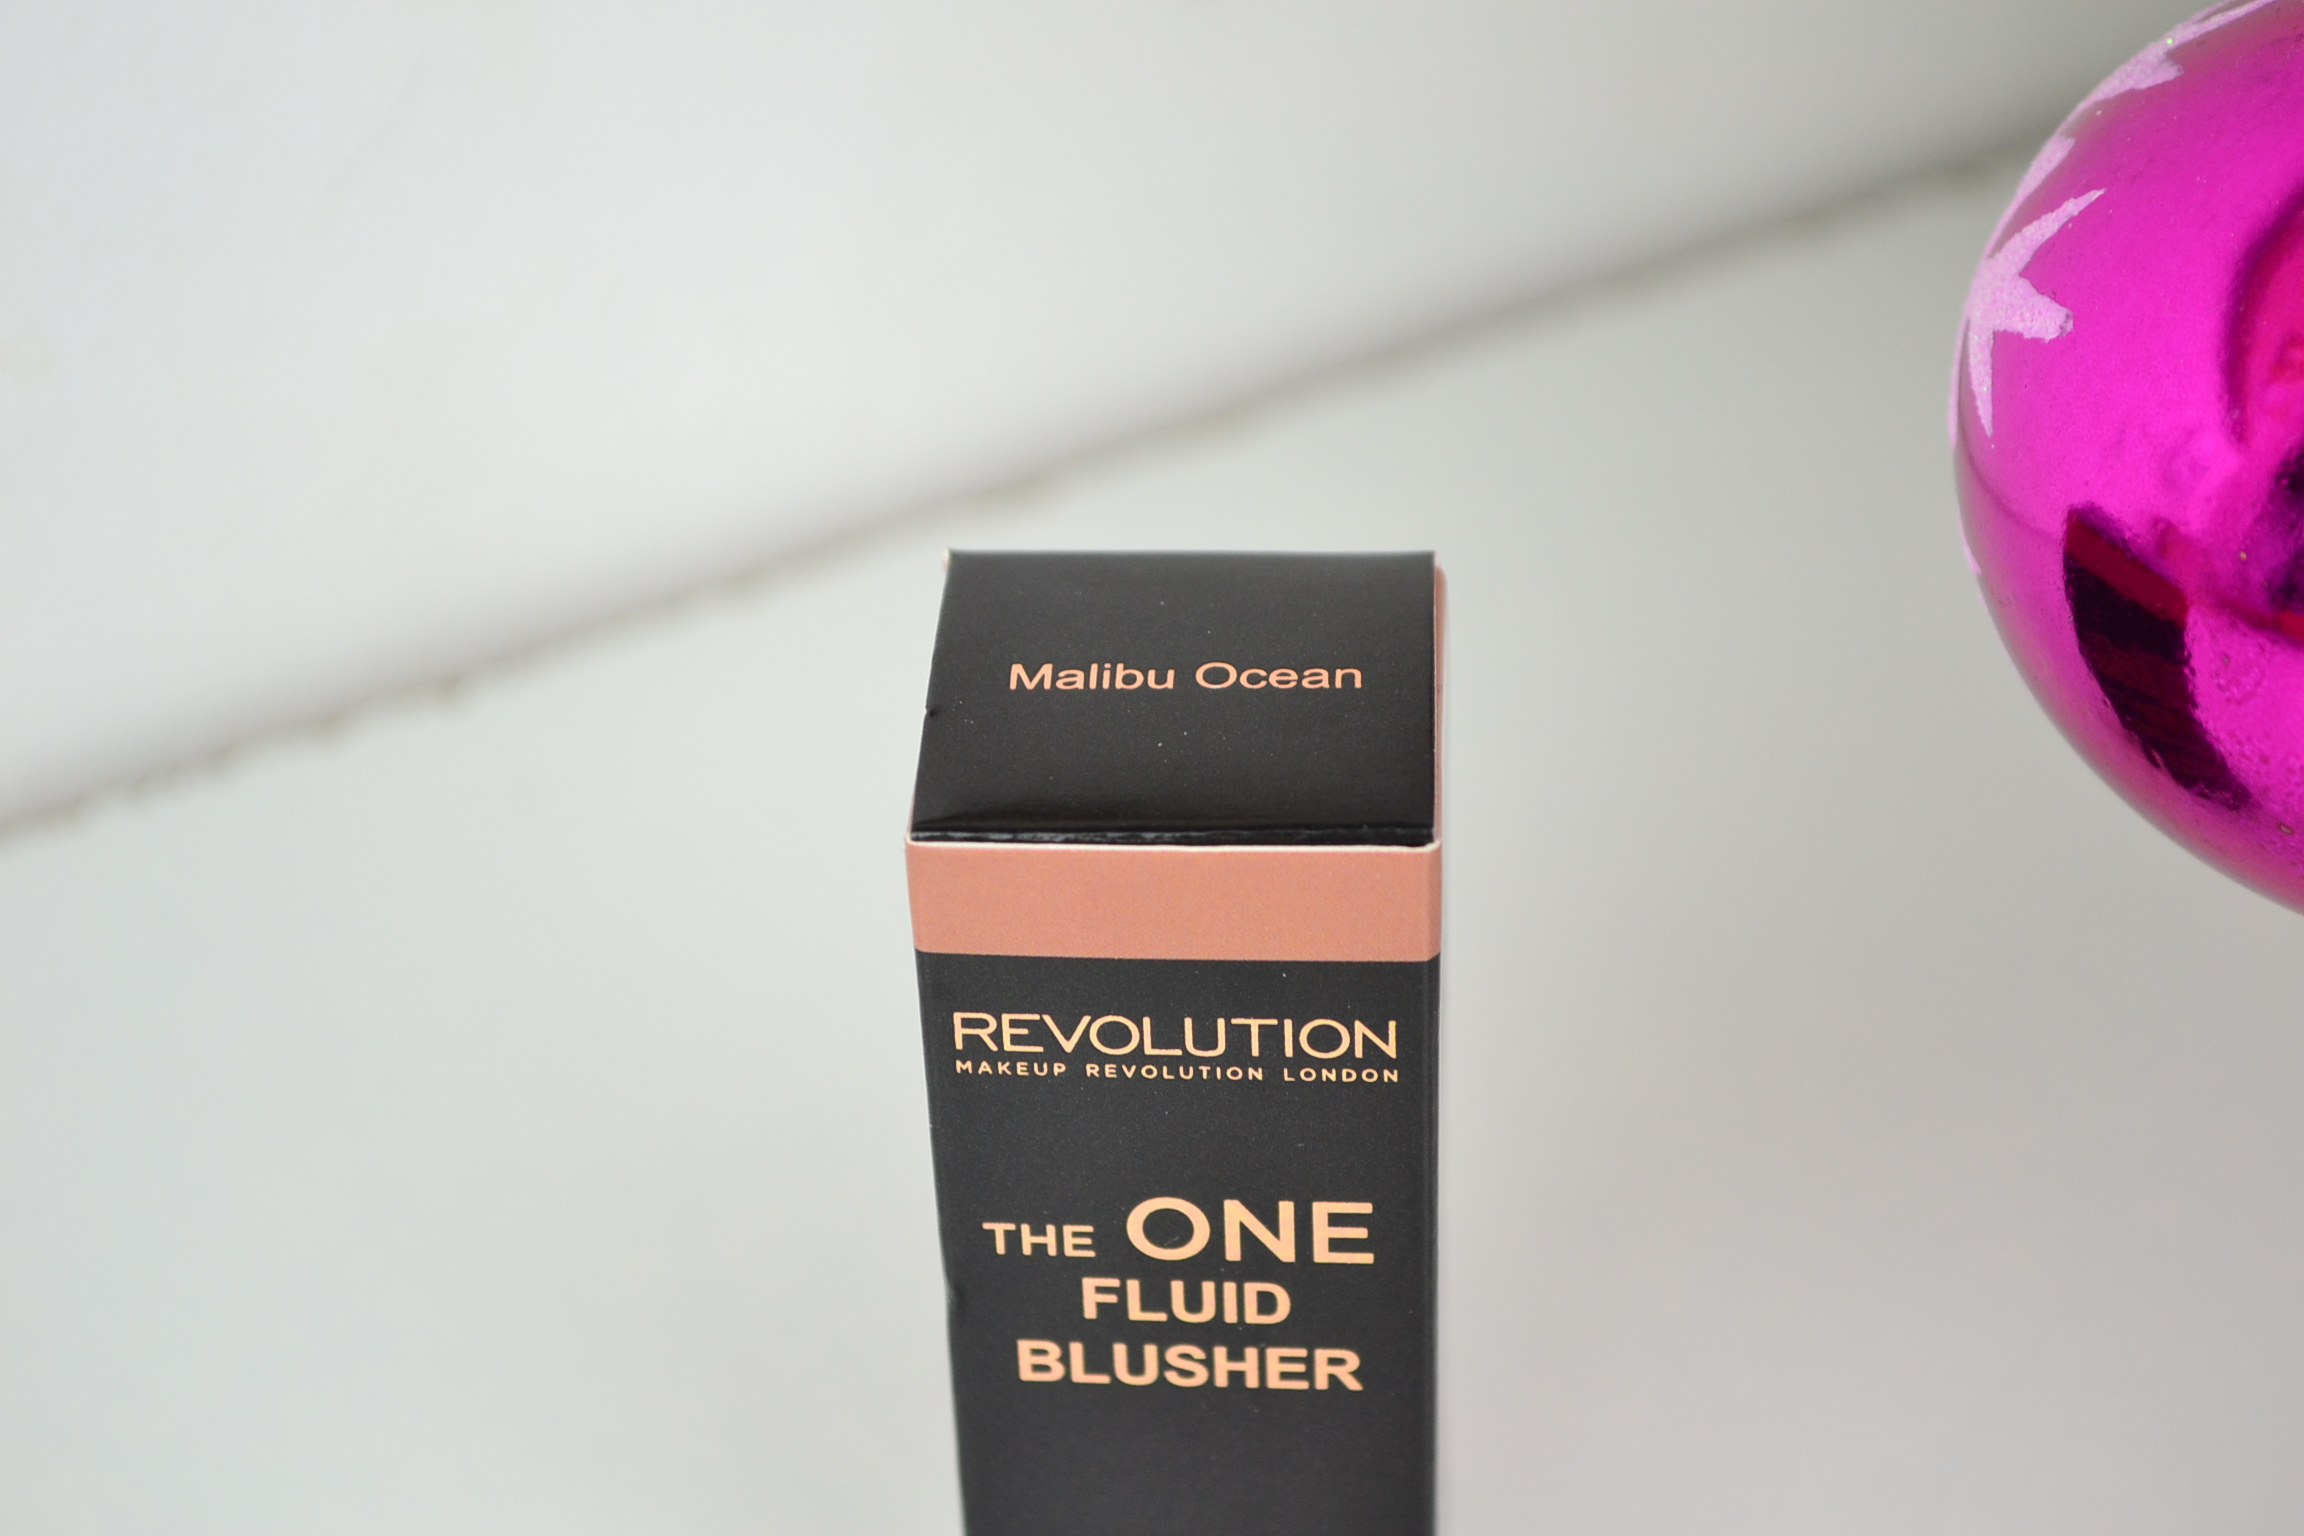 Makeup Revolution The One Fluid Blusher Malibu Ocean